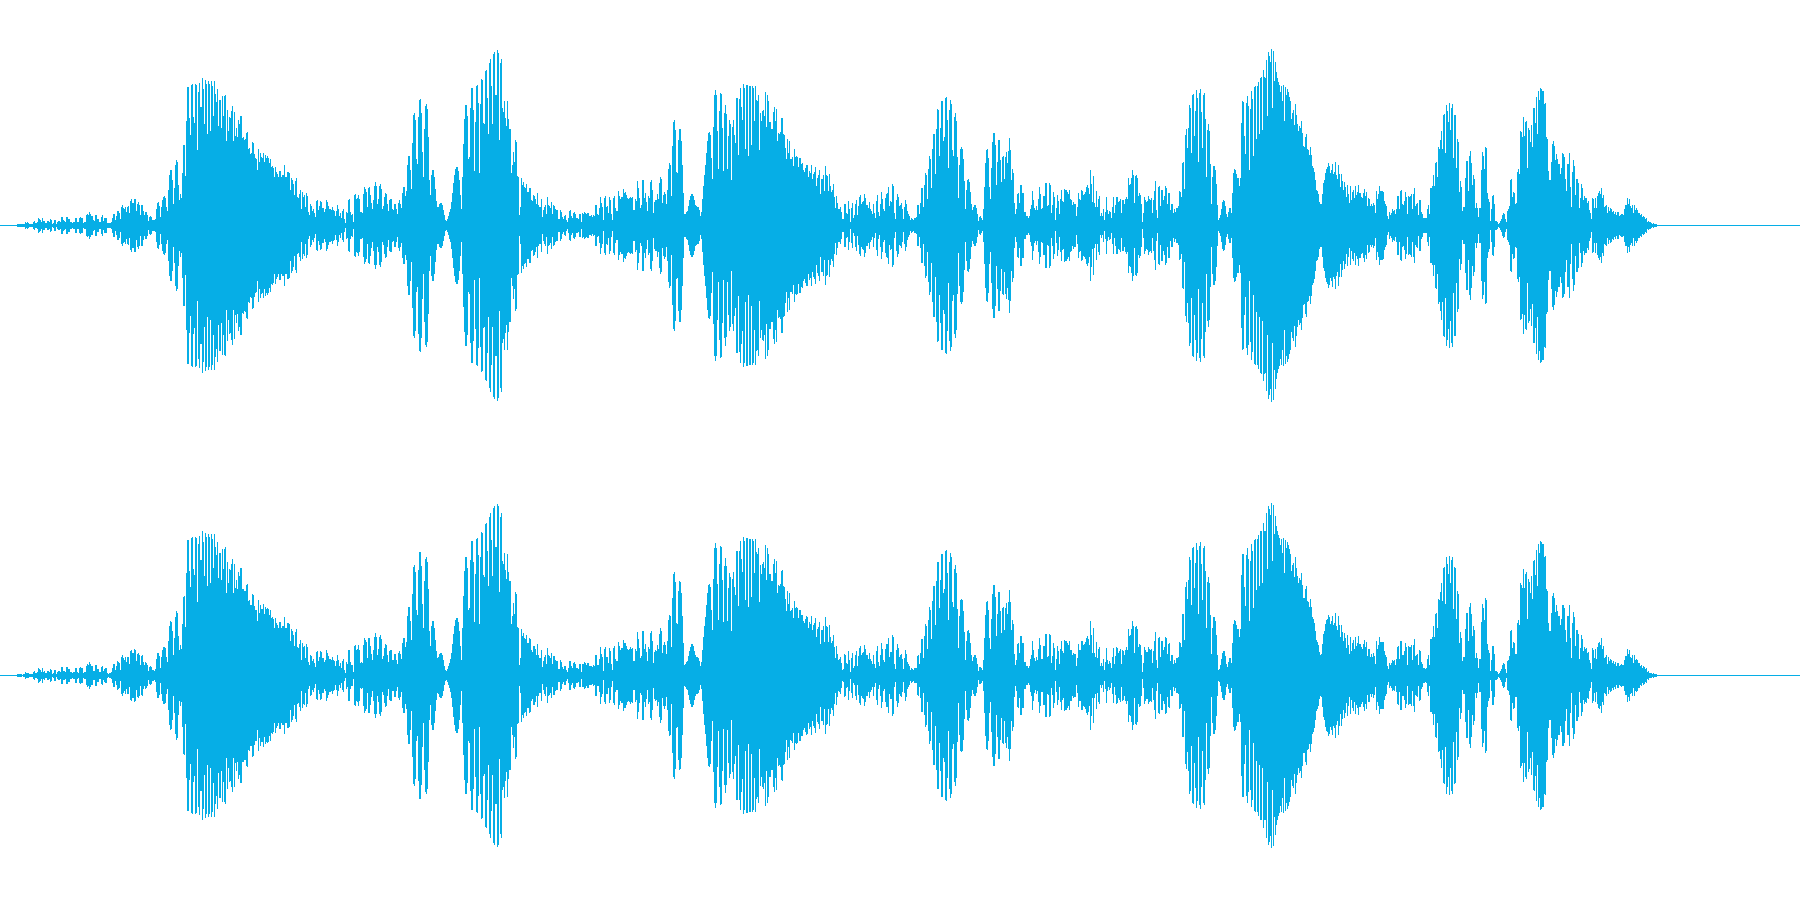 ポワポワポワポワポワポワ(上昇音)の再生済みの波形